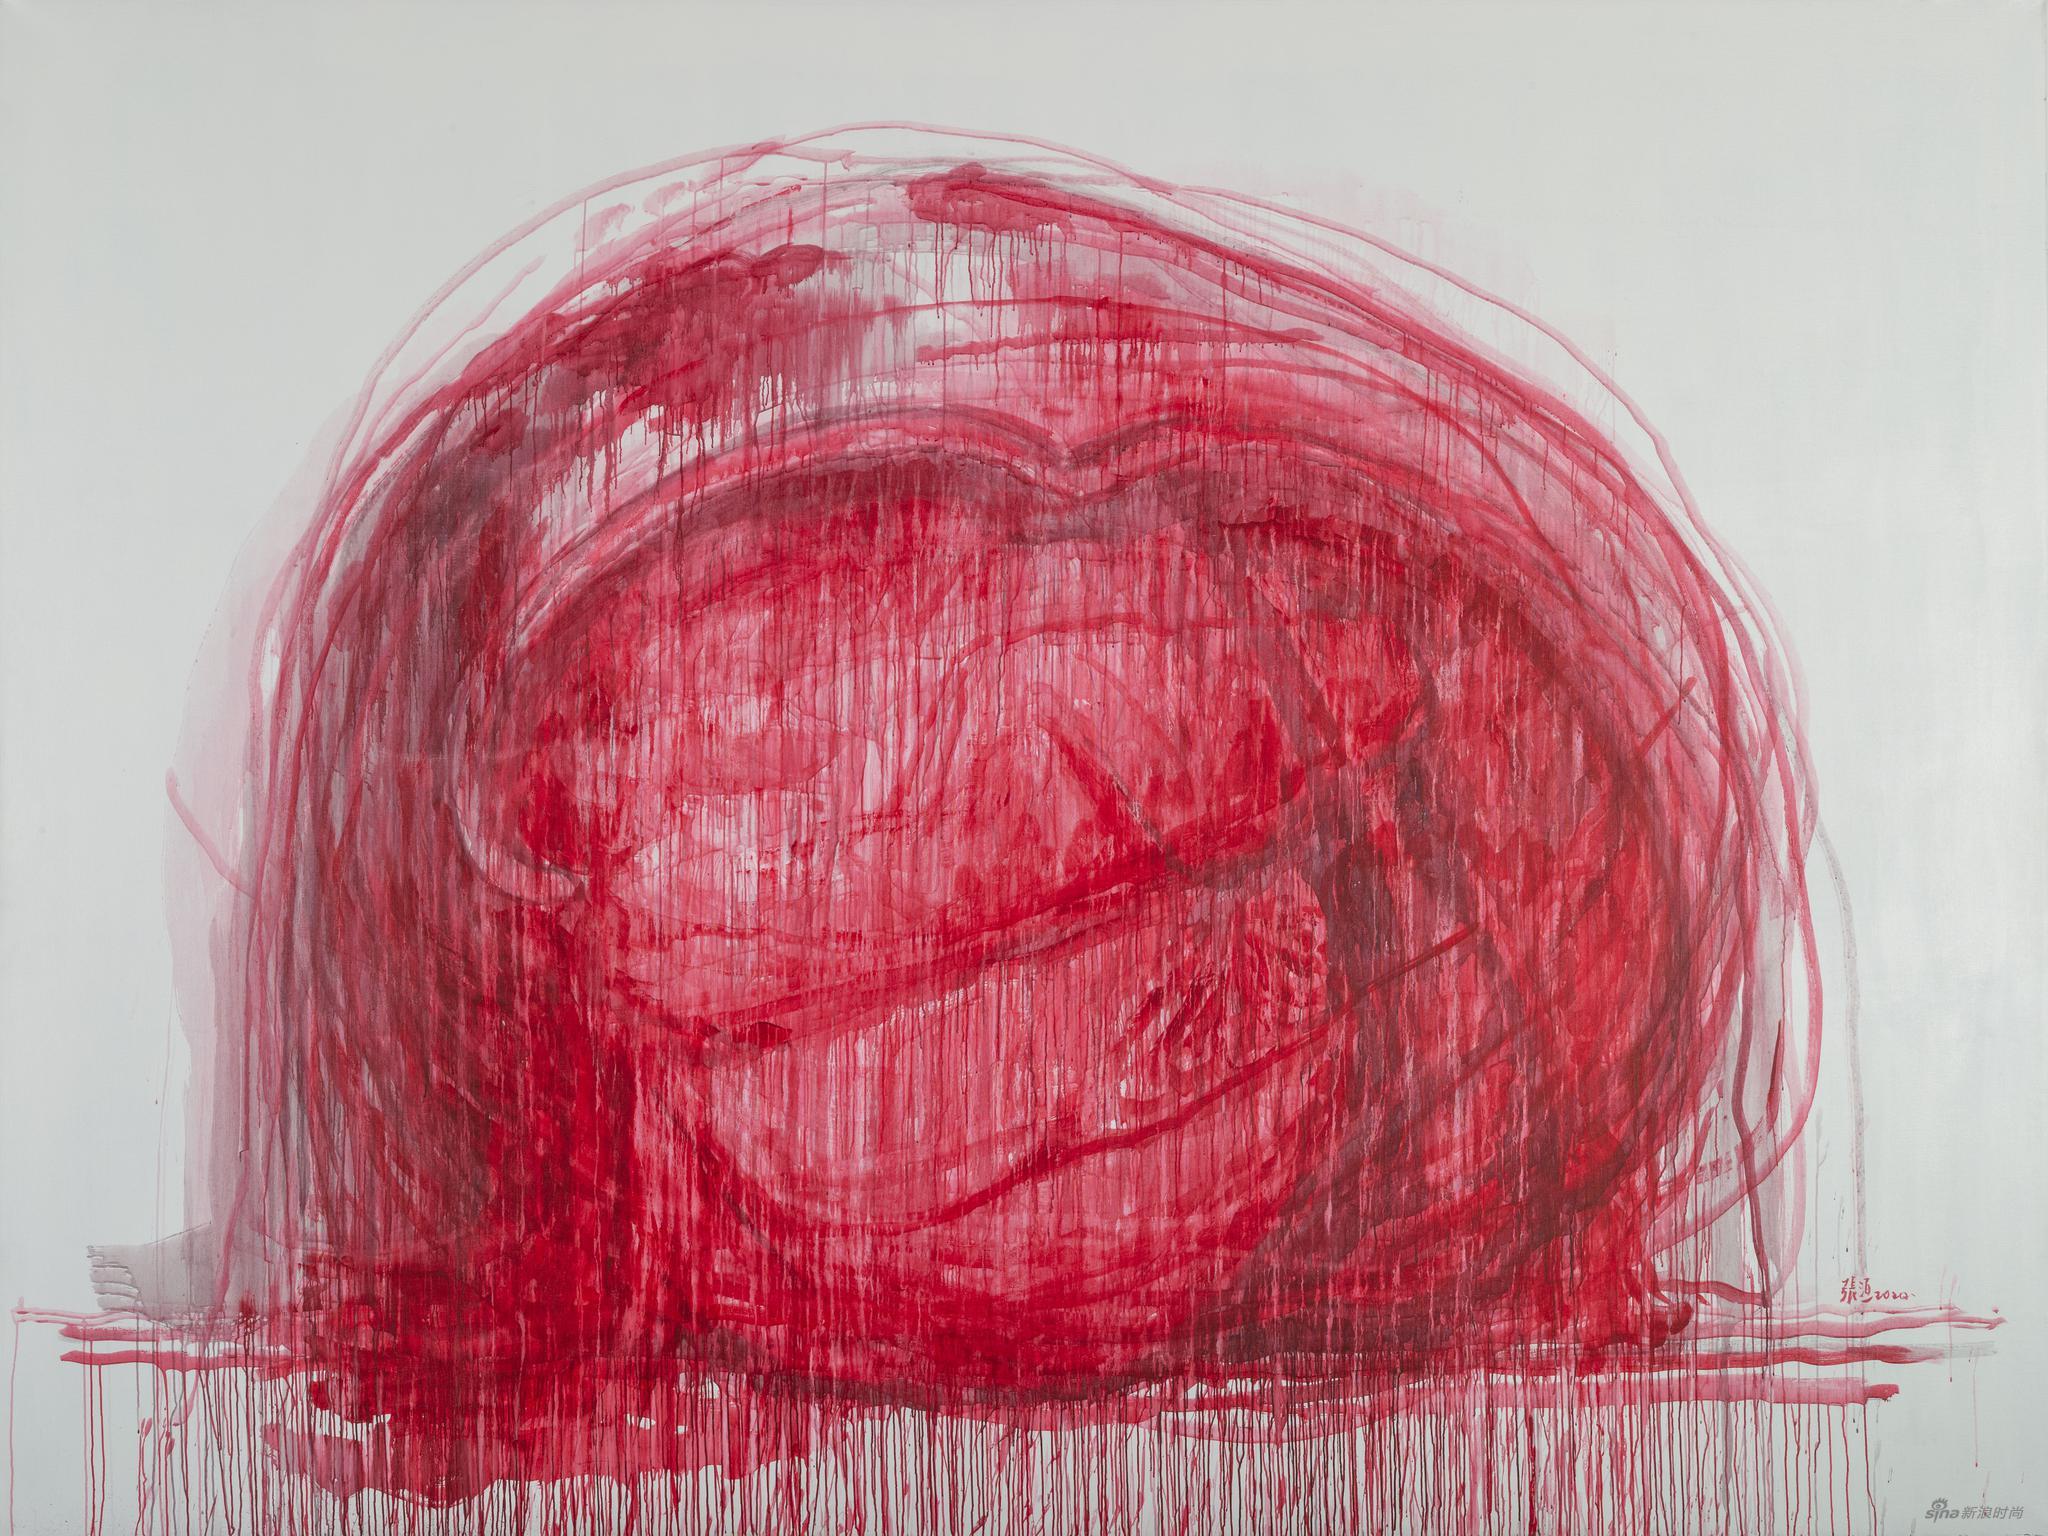 張洹, b.1965, Love No.2, 2020, Arcylic on Linen, 300 x 400 x 5 cm